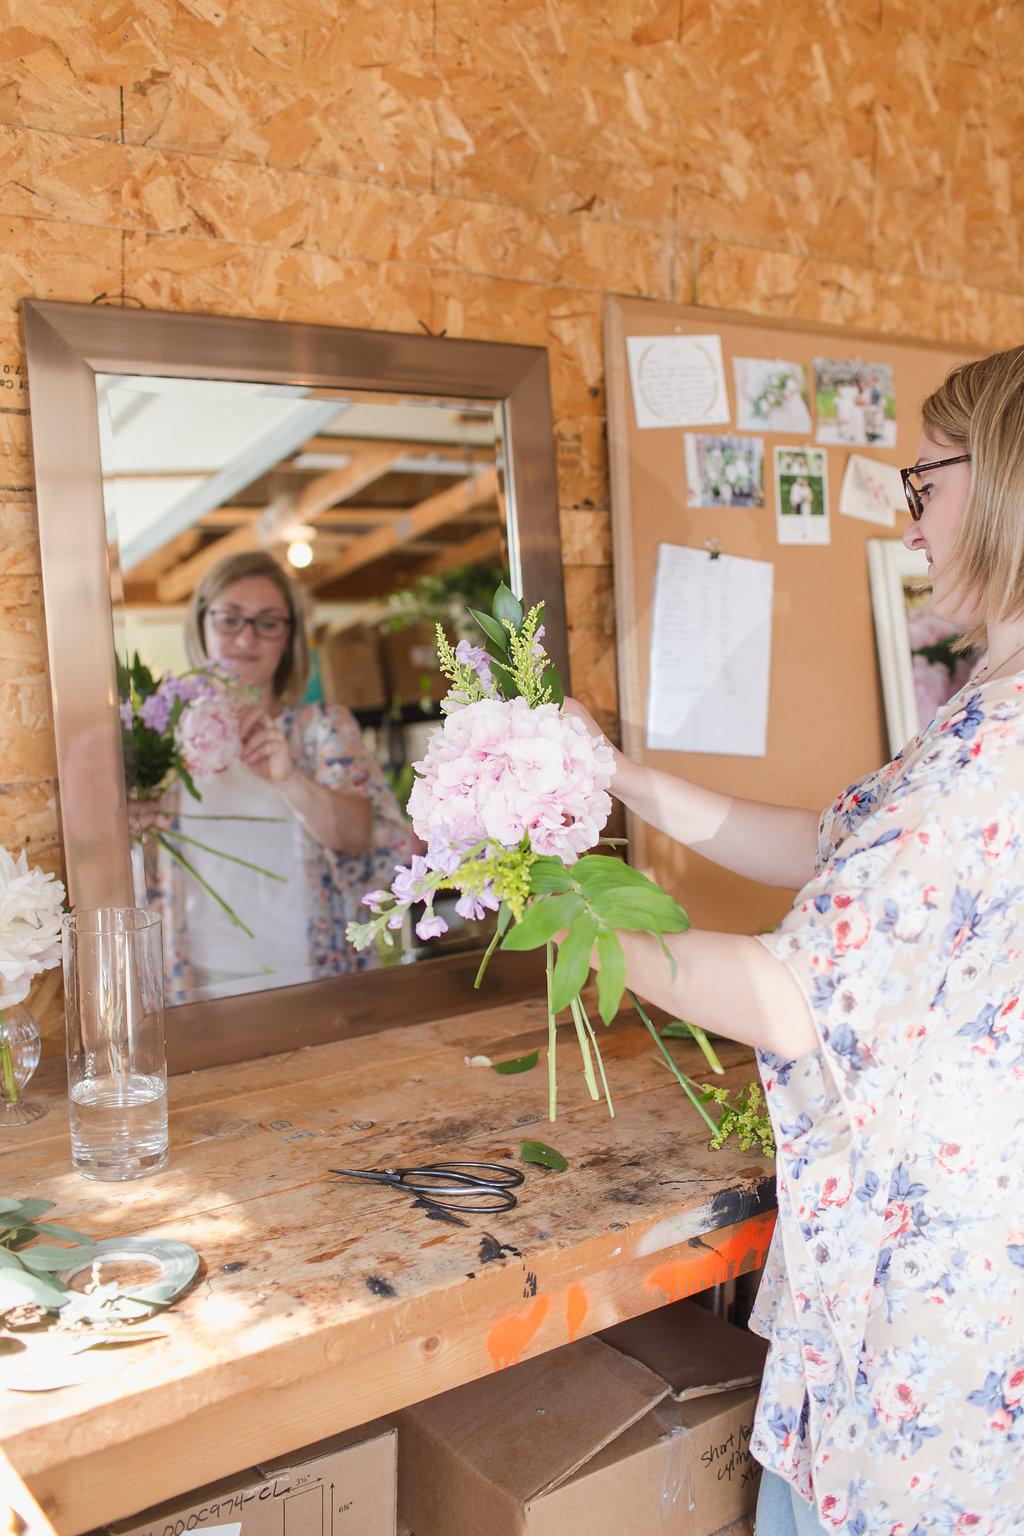 Stone House Creative - Florist Studio Tour